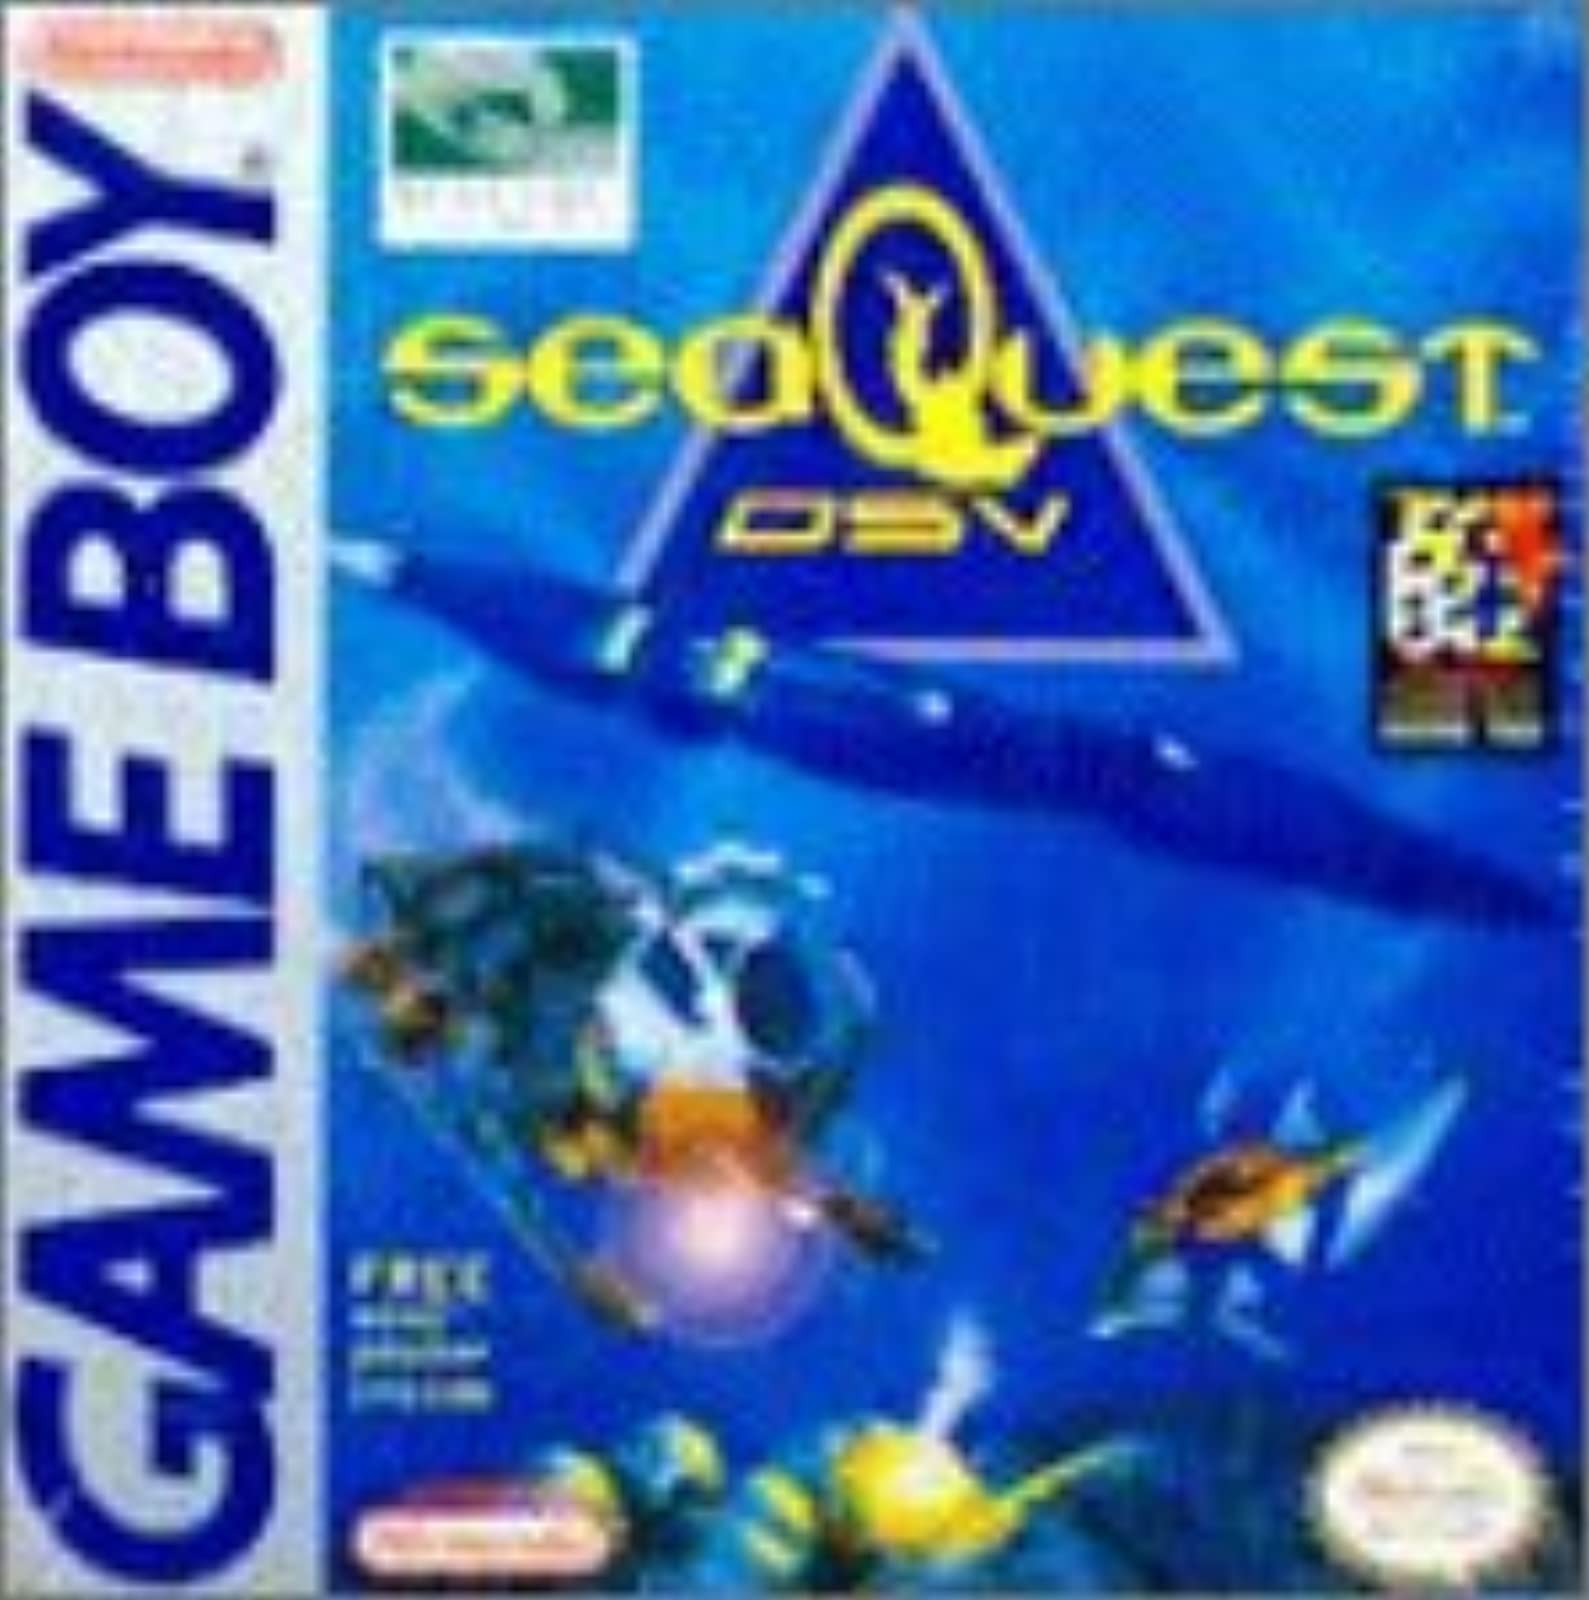 Seaquest Dsv On Gameboy